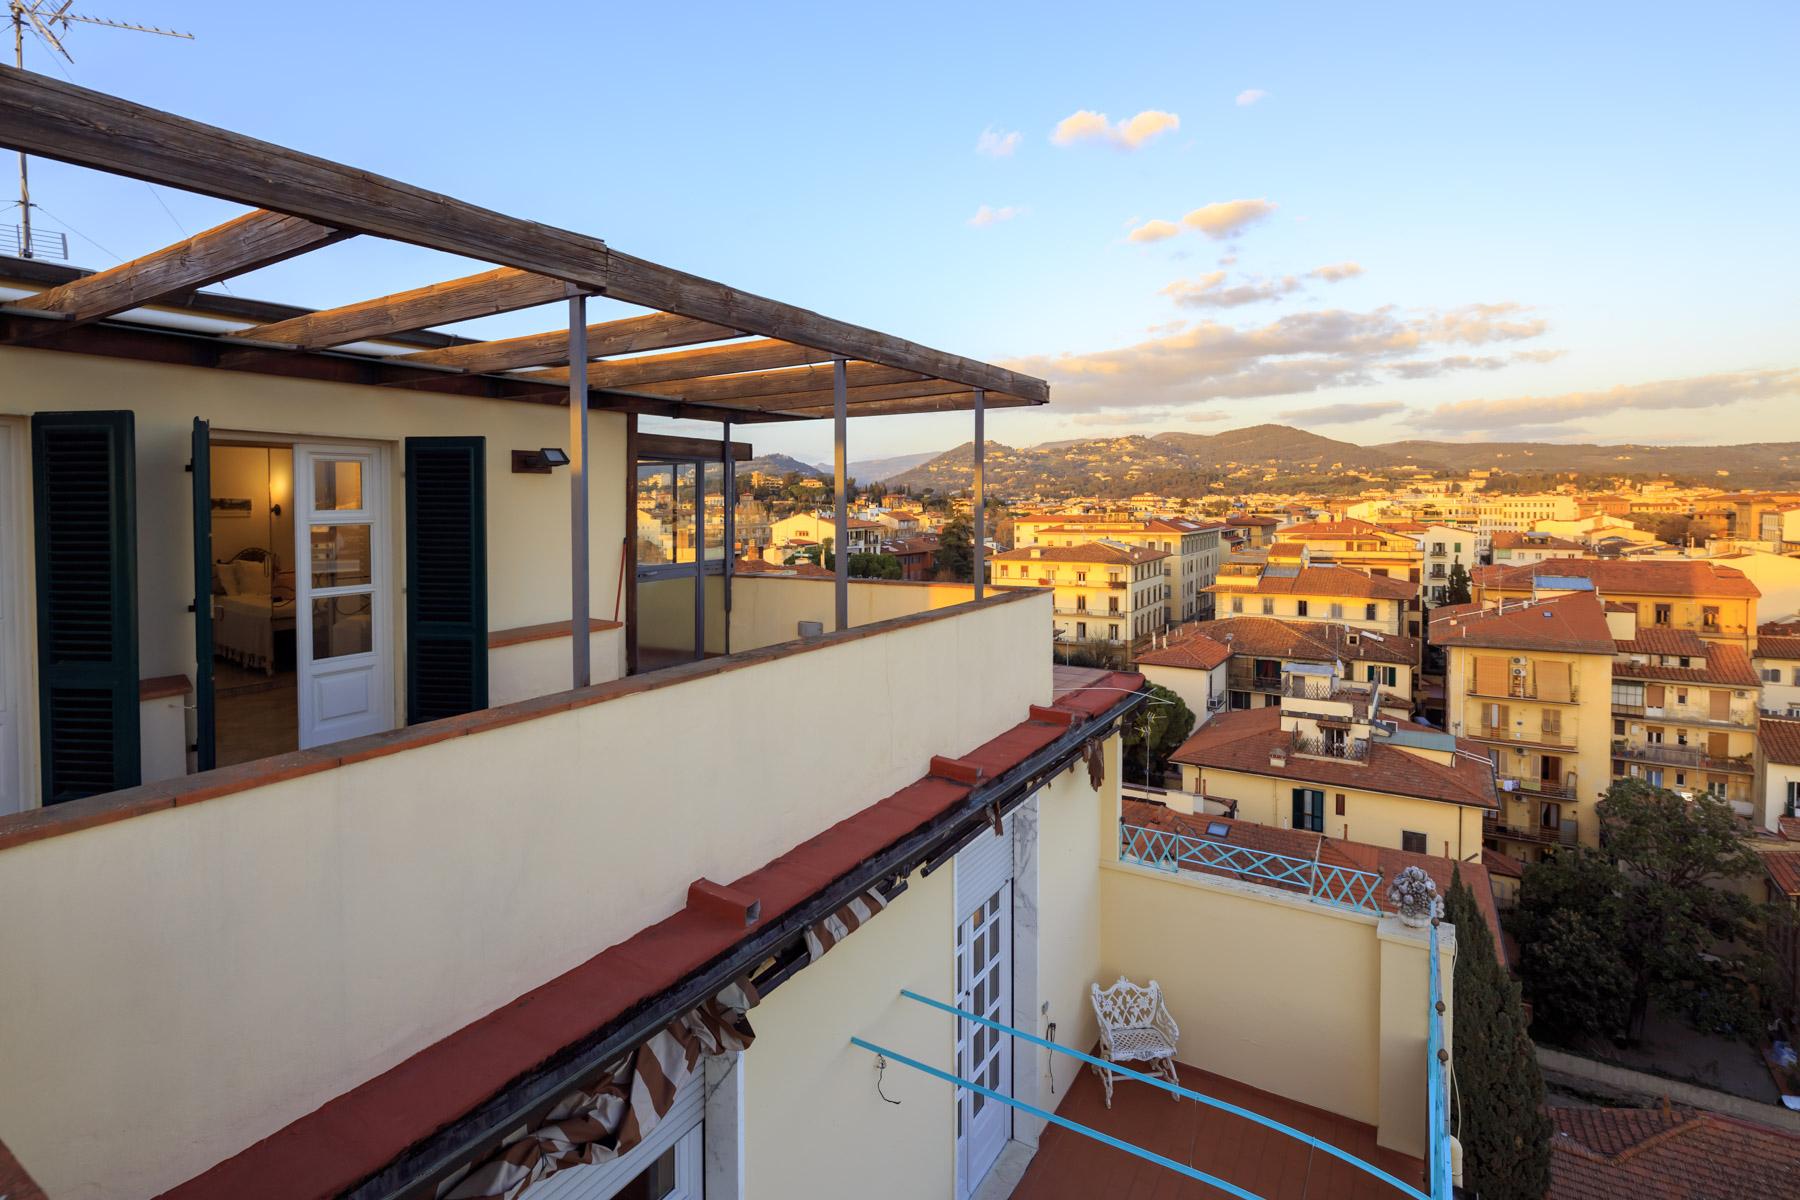 Attico in Vendita a Firenze: 5 locali, 250 mq - Foto 23